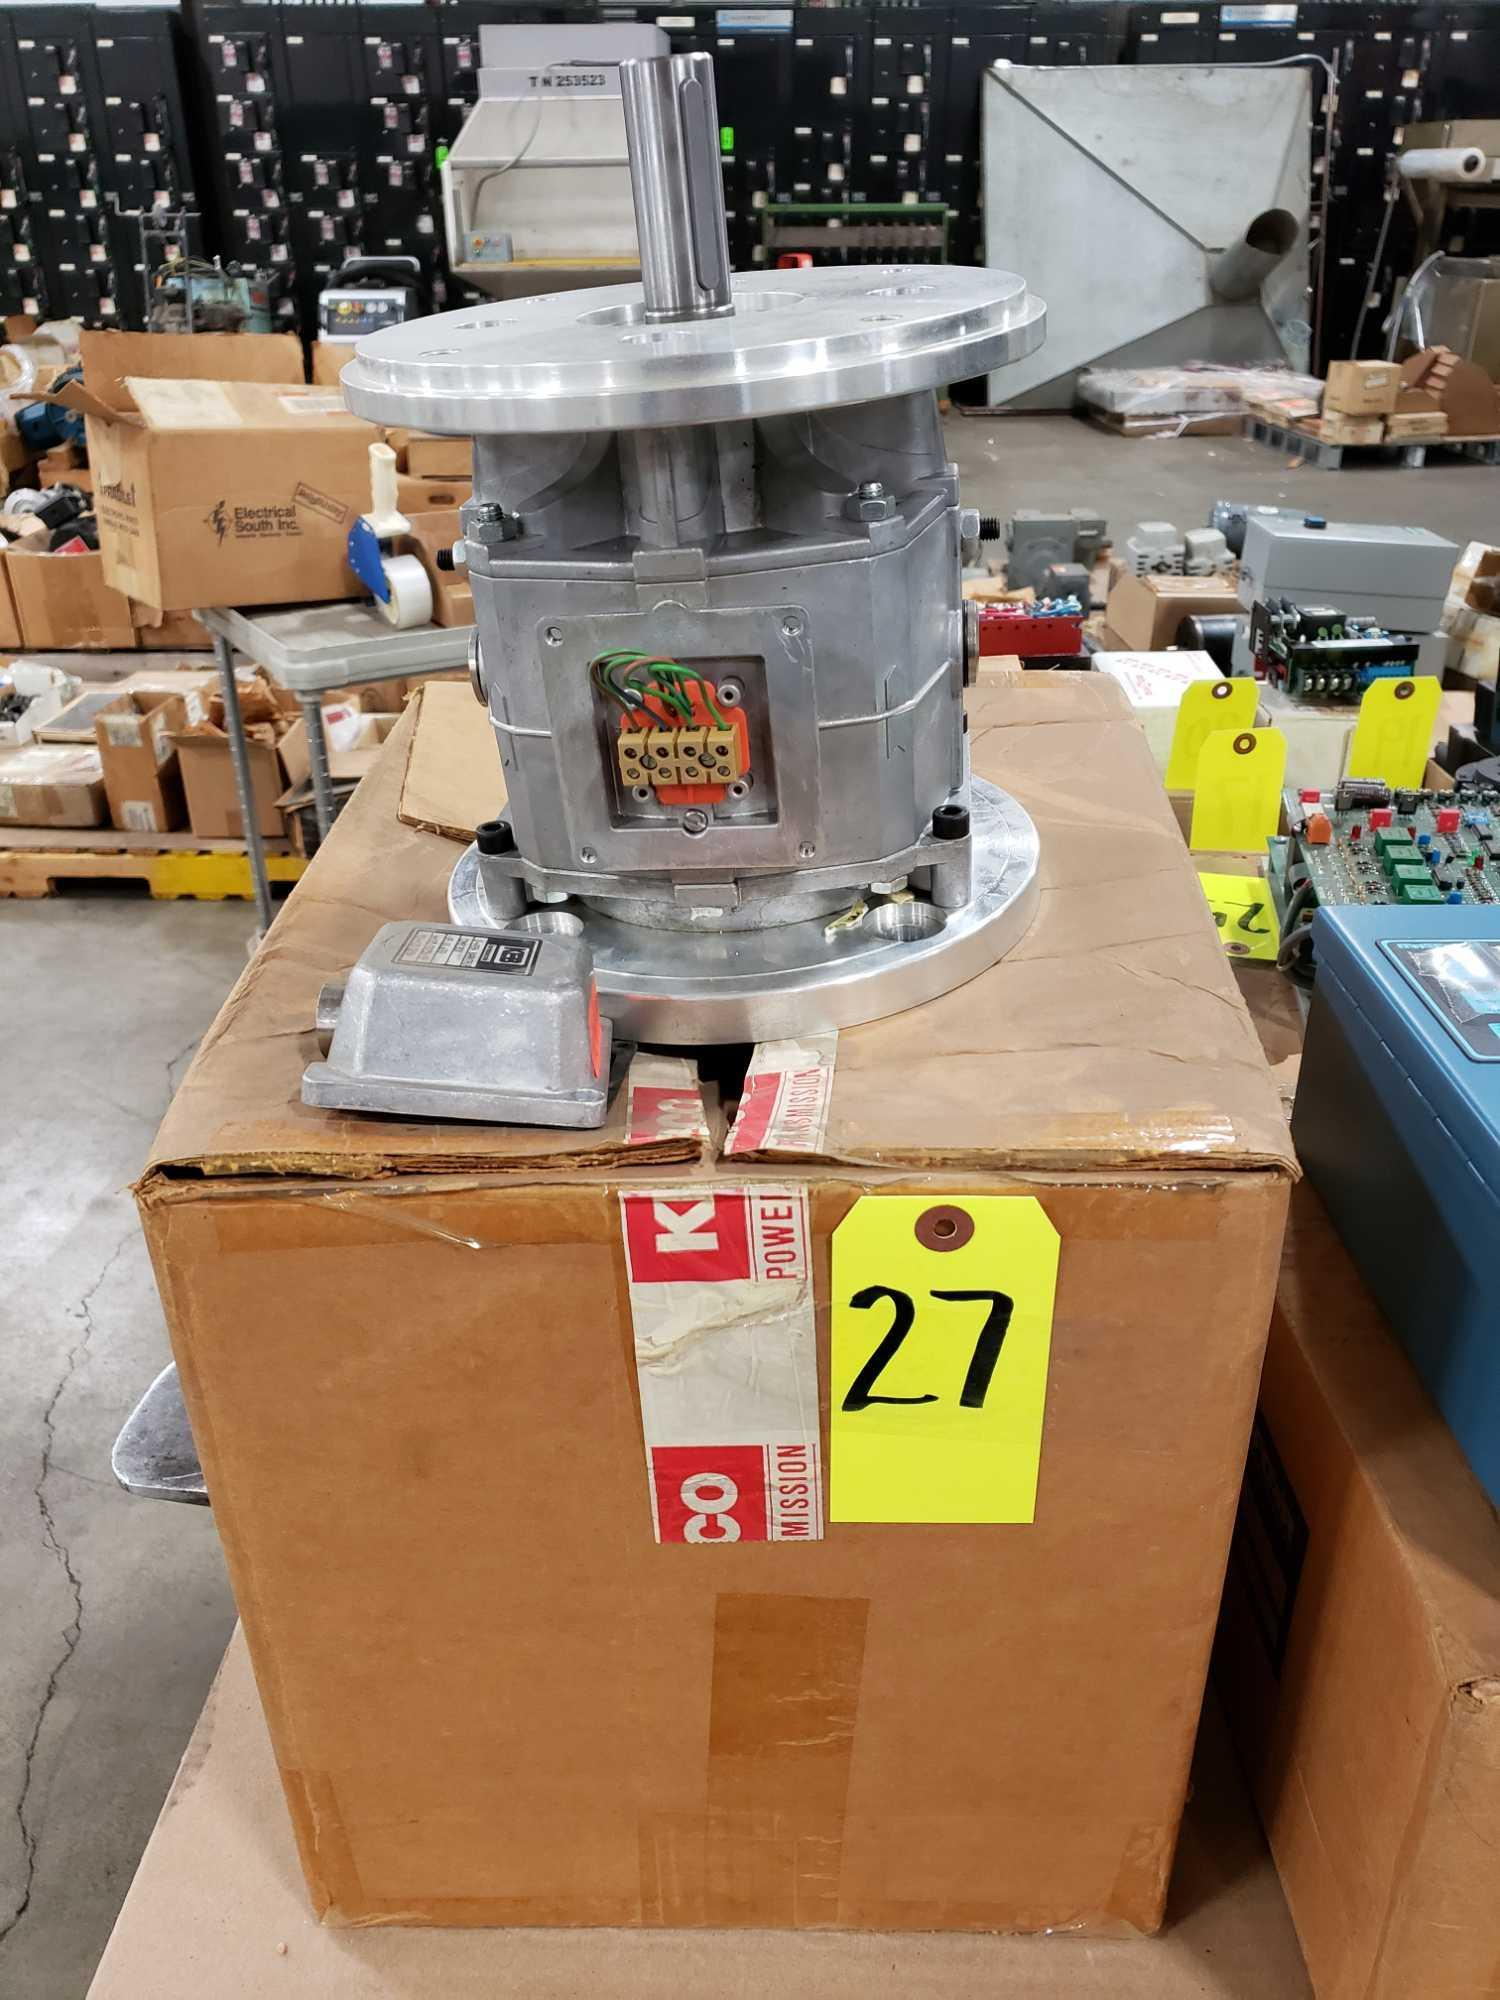 KEB Combibox model 09.10-670. New in box.